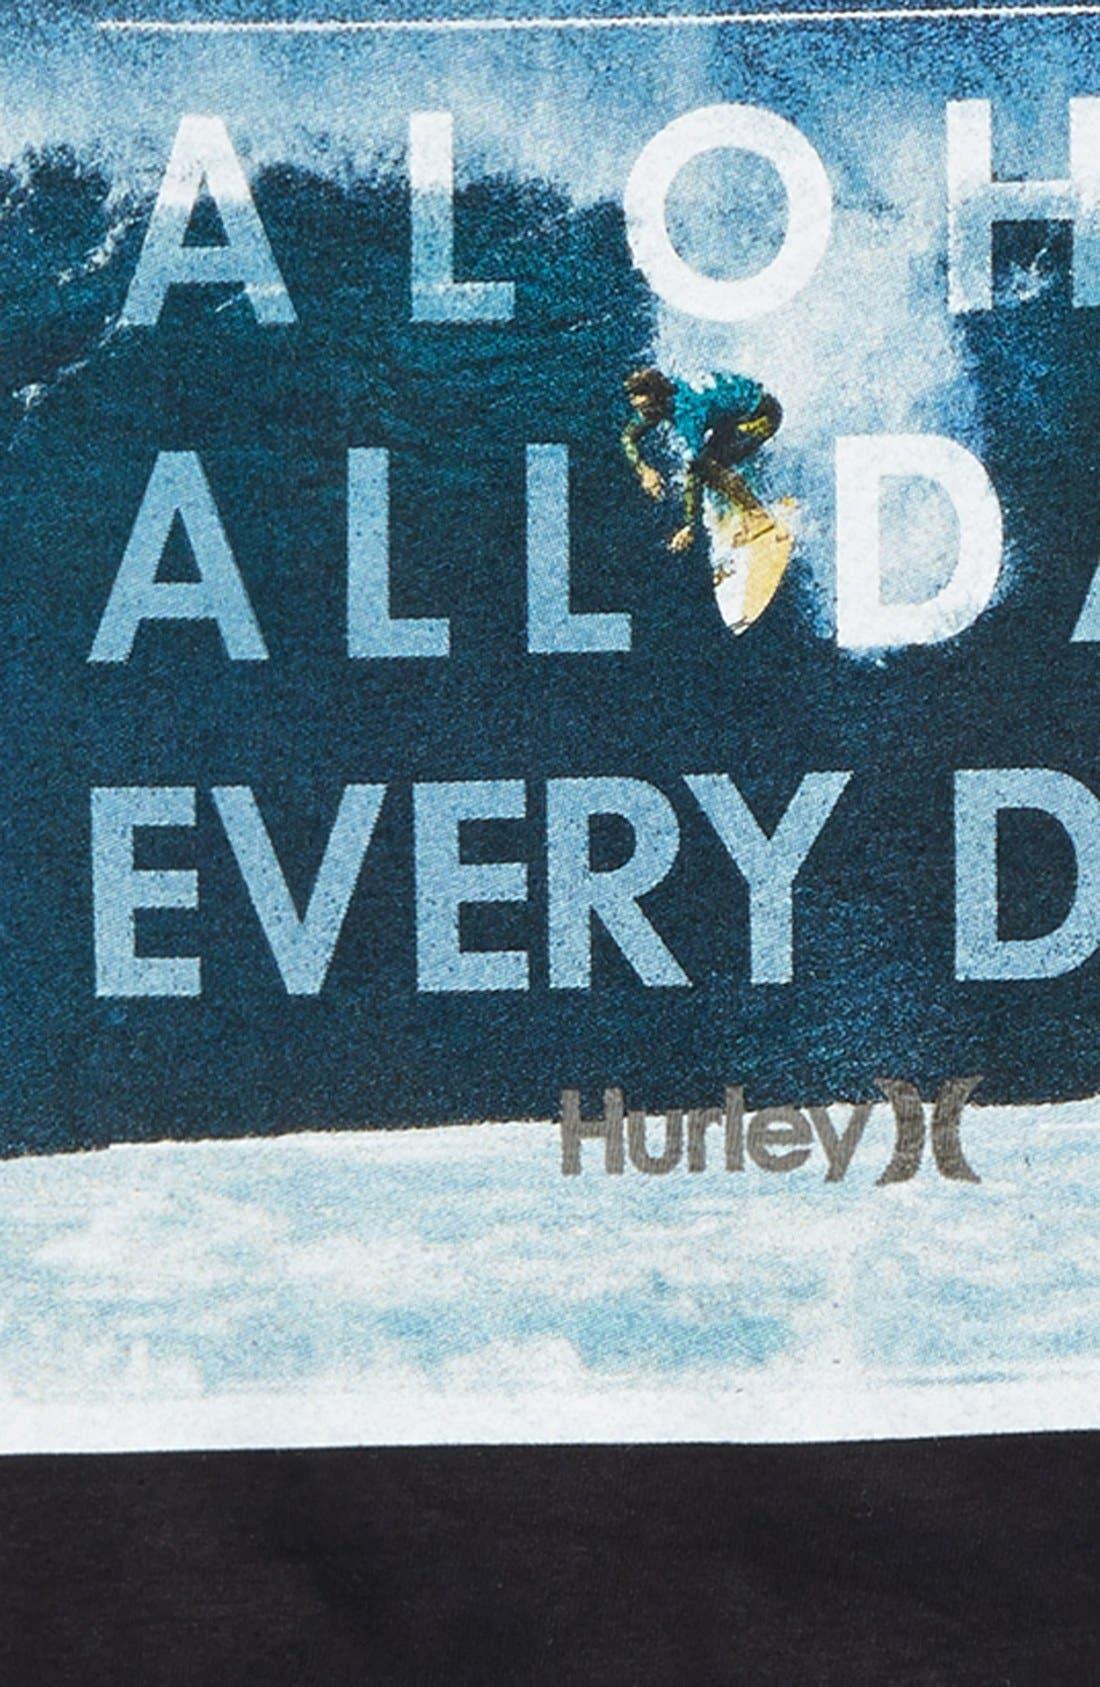 HURLEY,                             'Aloha All Day Every Day' Screenprint T-Shirt,                             Alternate thumbnail 2, color,                             001